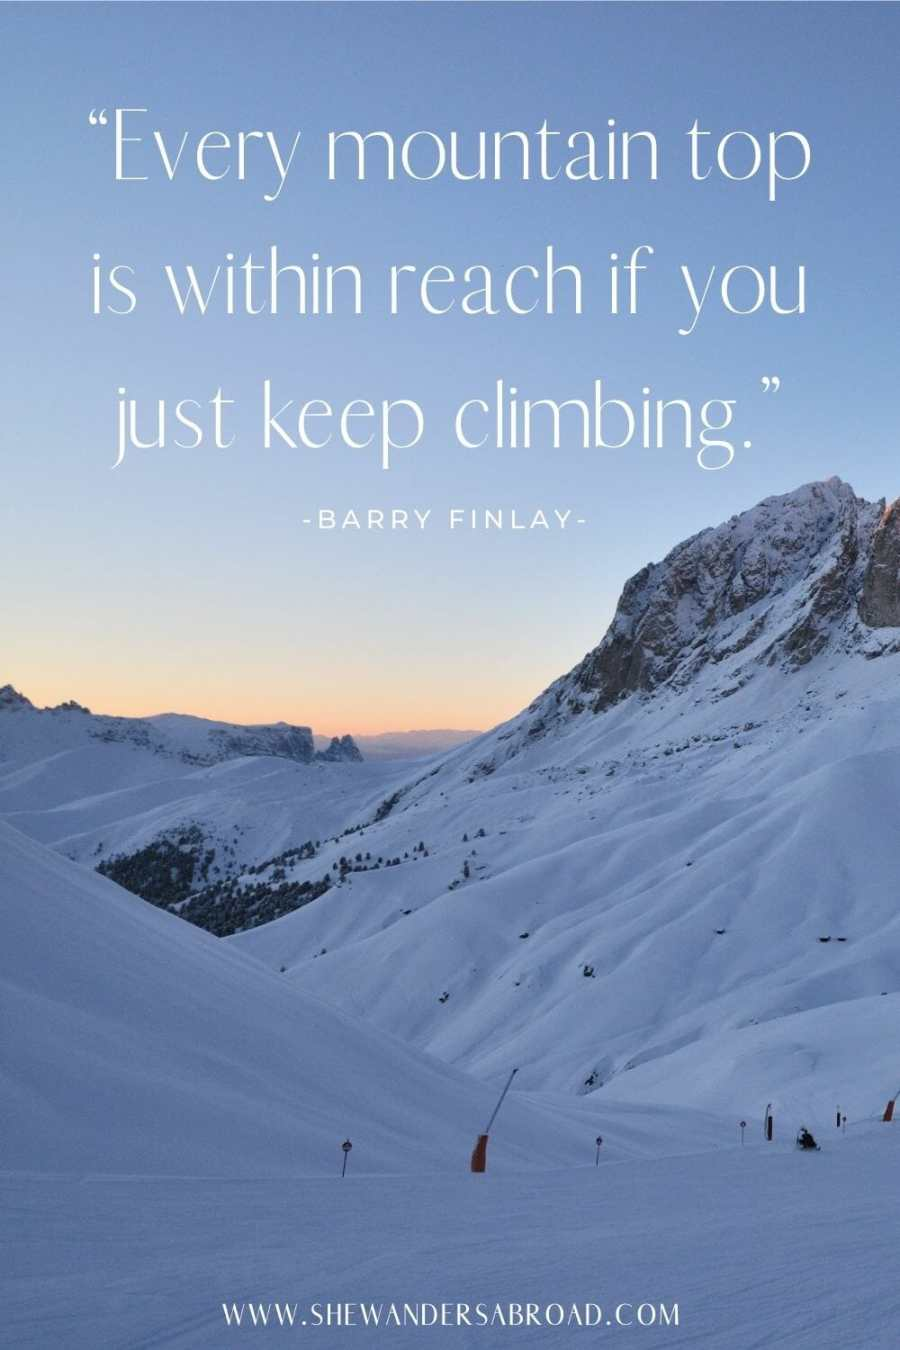 Motivational mountain captions for Instagram